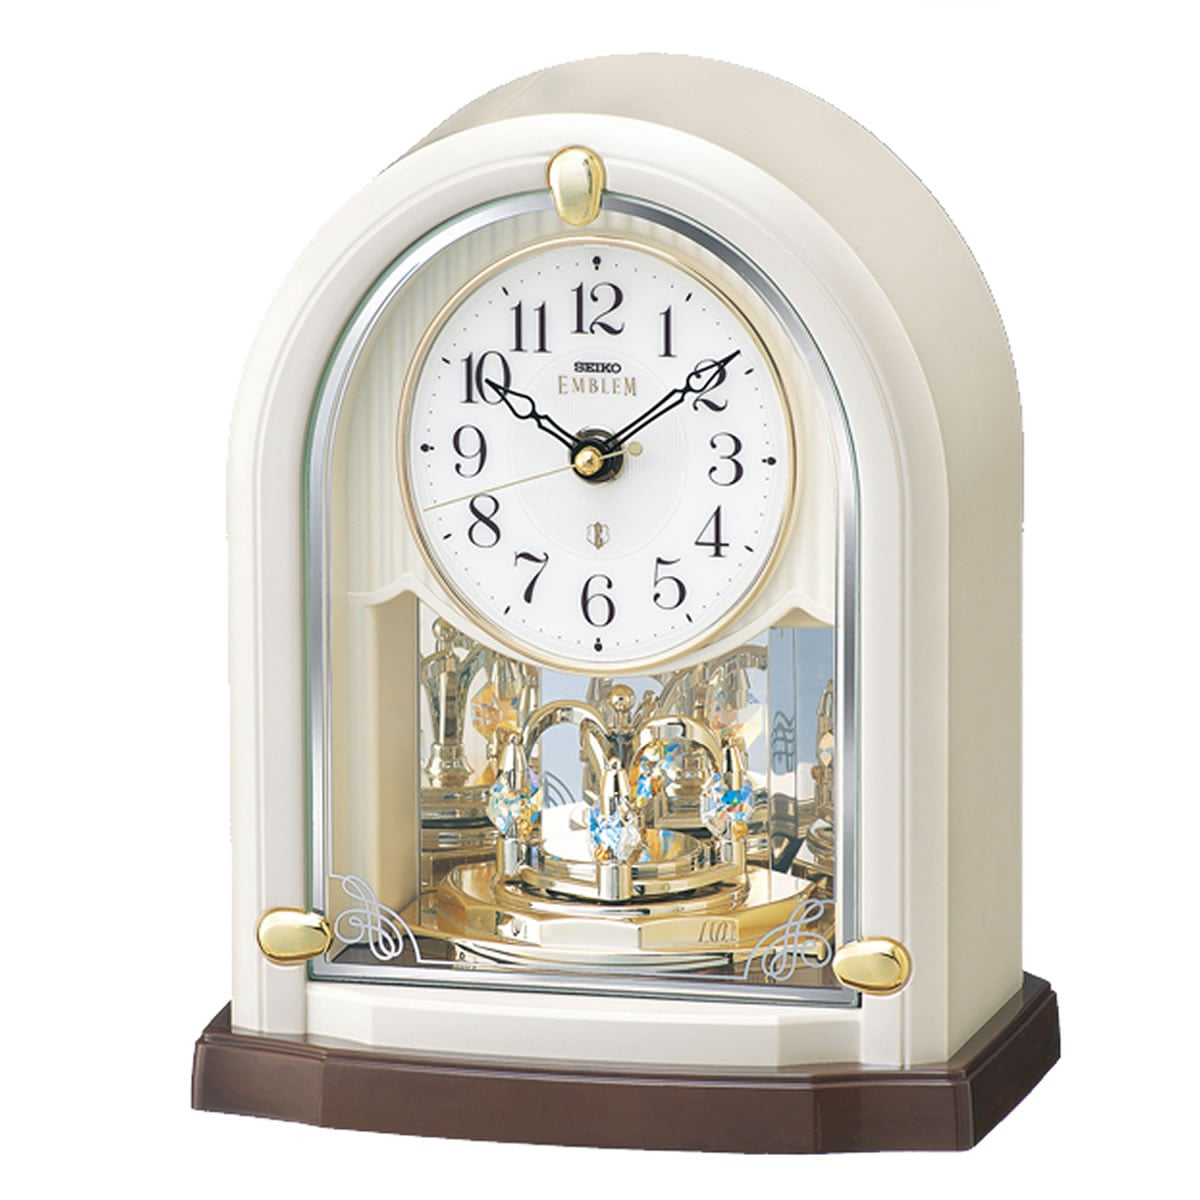 SEIKO EMBLEM(セイコー エムブレム)回転飾り付 電波置き時計 HW593W 白